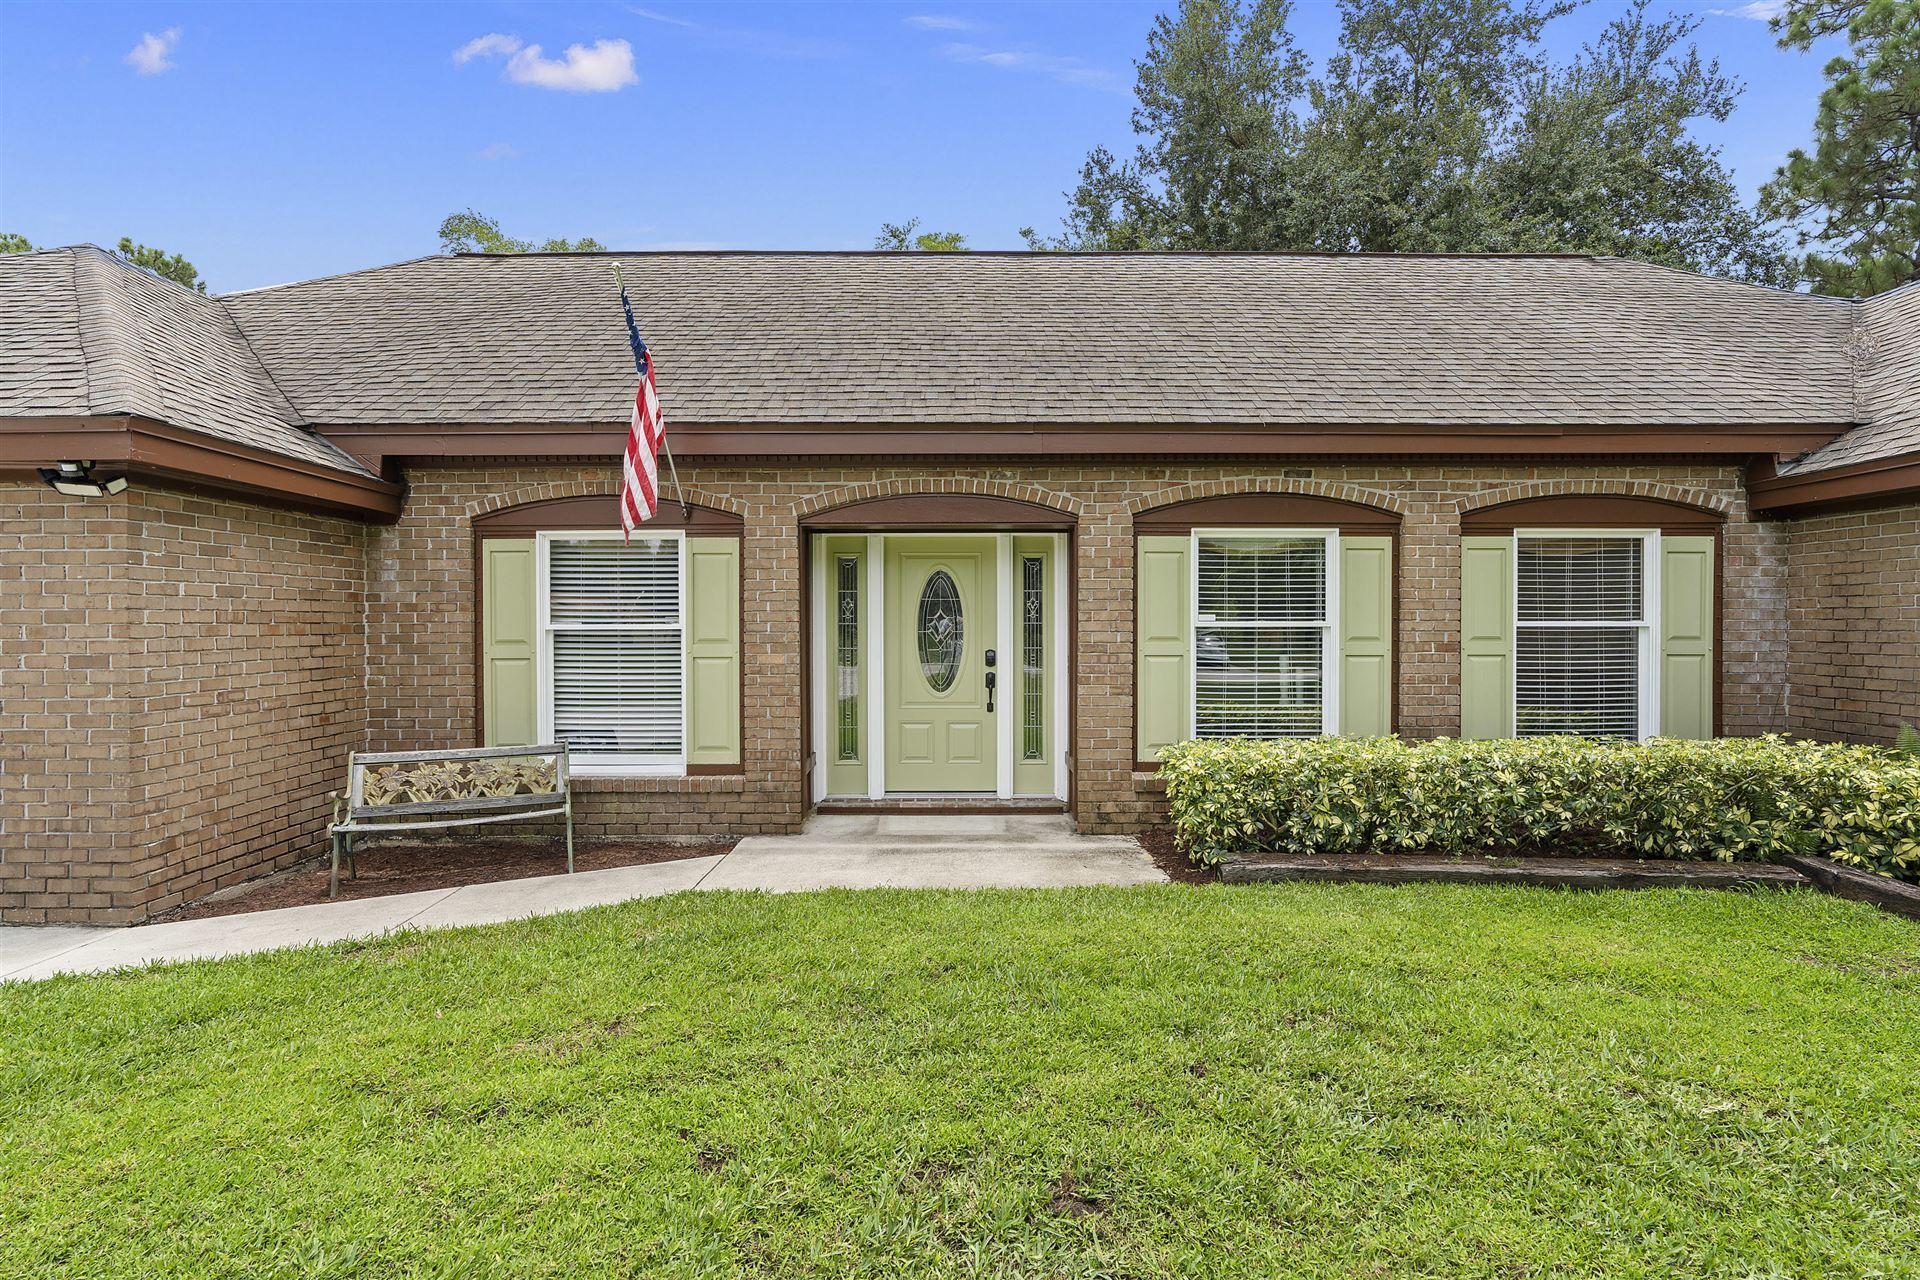 Photo of 8521 Hidden Pines Road, Fort Pierce, FL 34945 (MLS # RX-10726532)